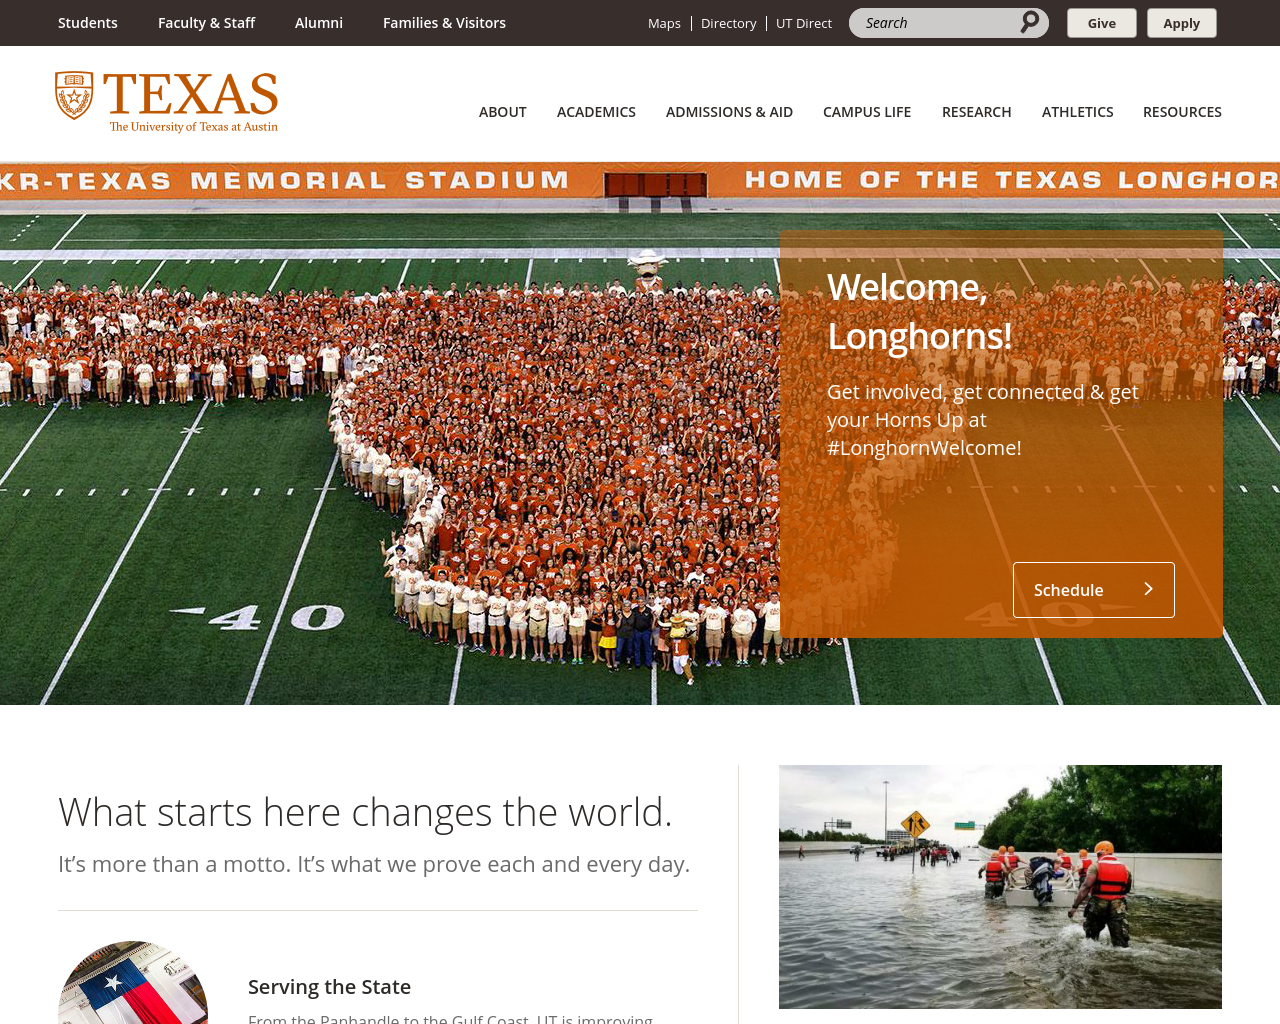 Texas-Student-Media-Advertising-Reviews-Pricing